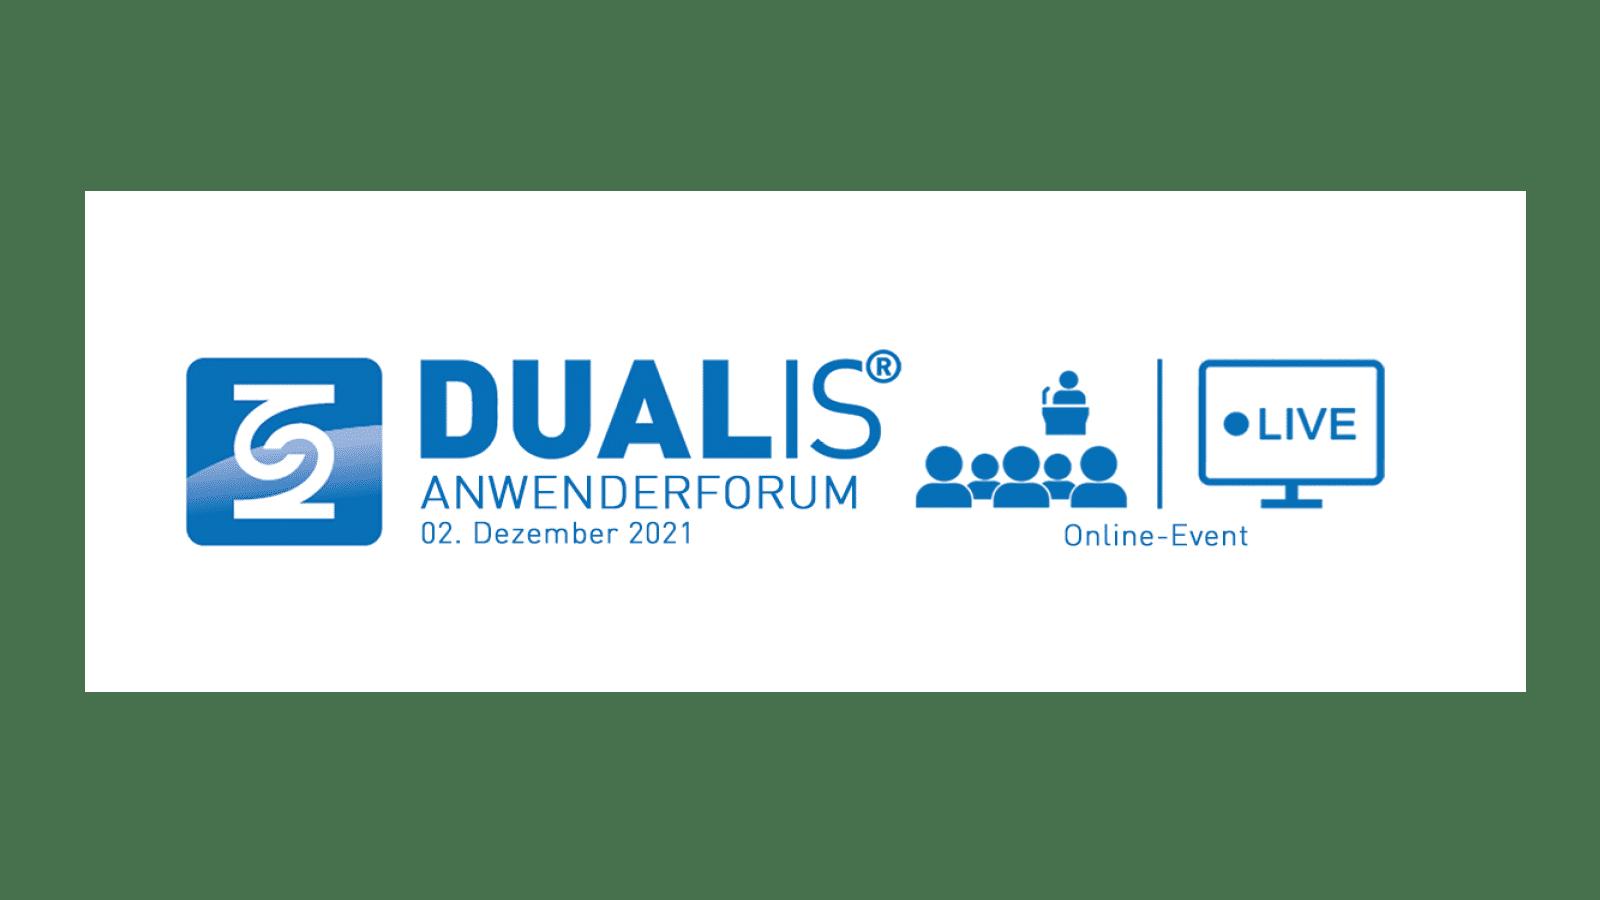 DUALIS Anwenderforum 2021